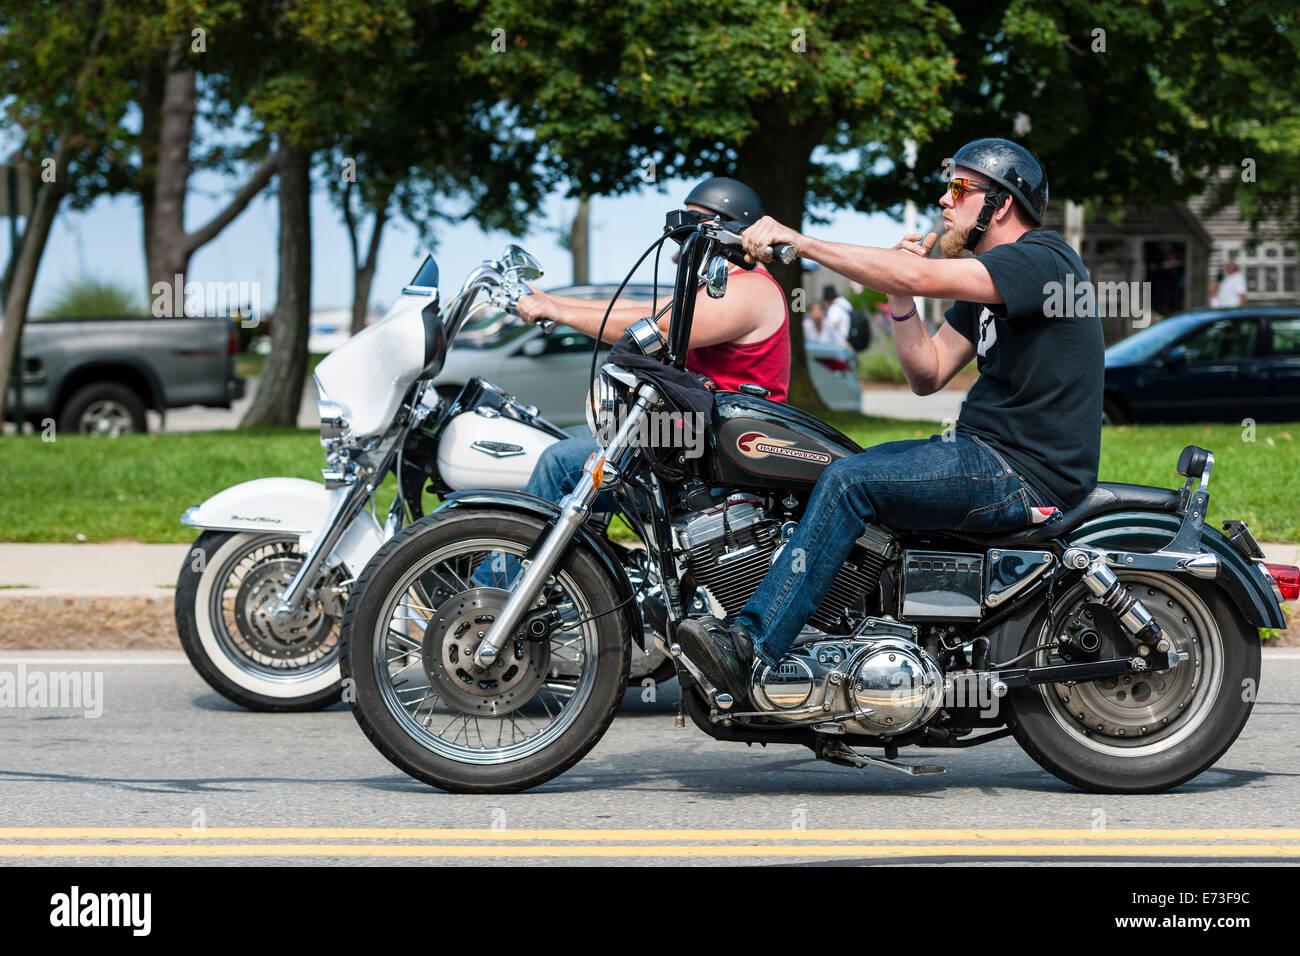 Harley Davidson Rider - Stock Image